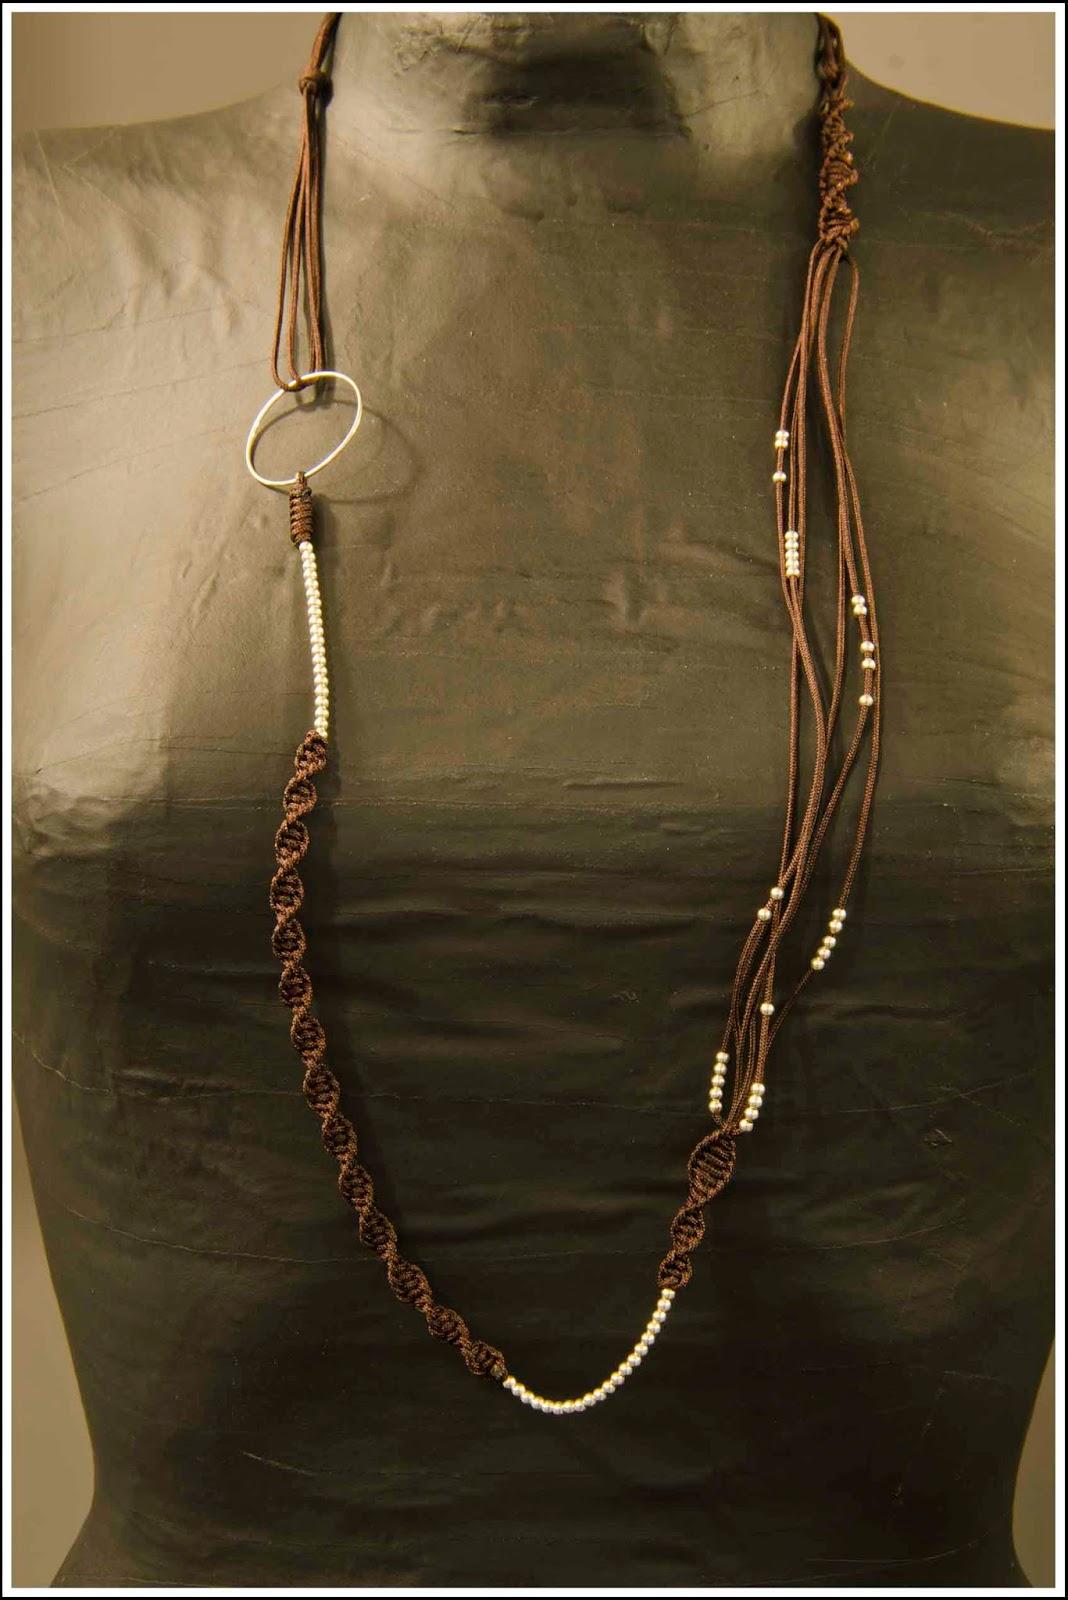 Collar largo de plata montado en cordón marrón